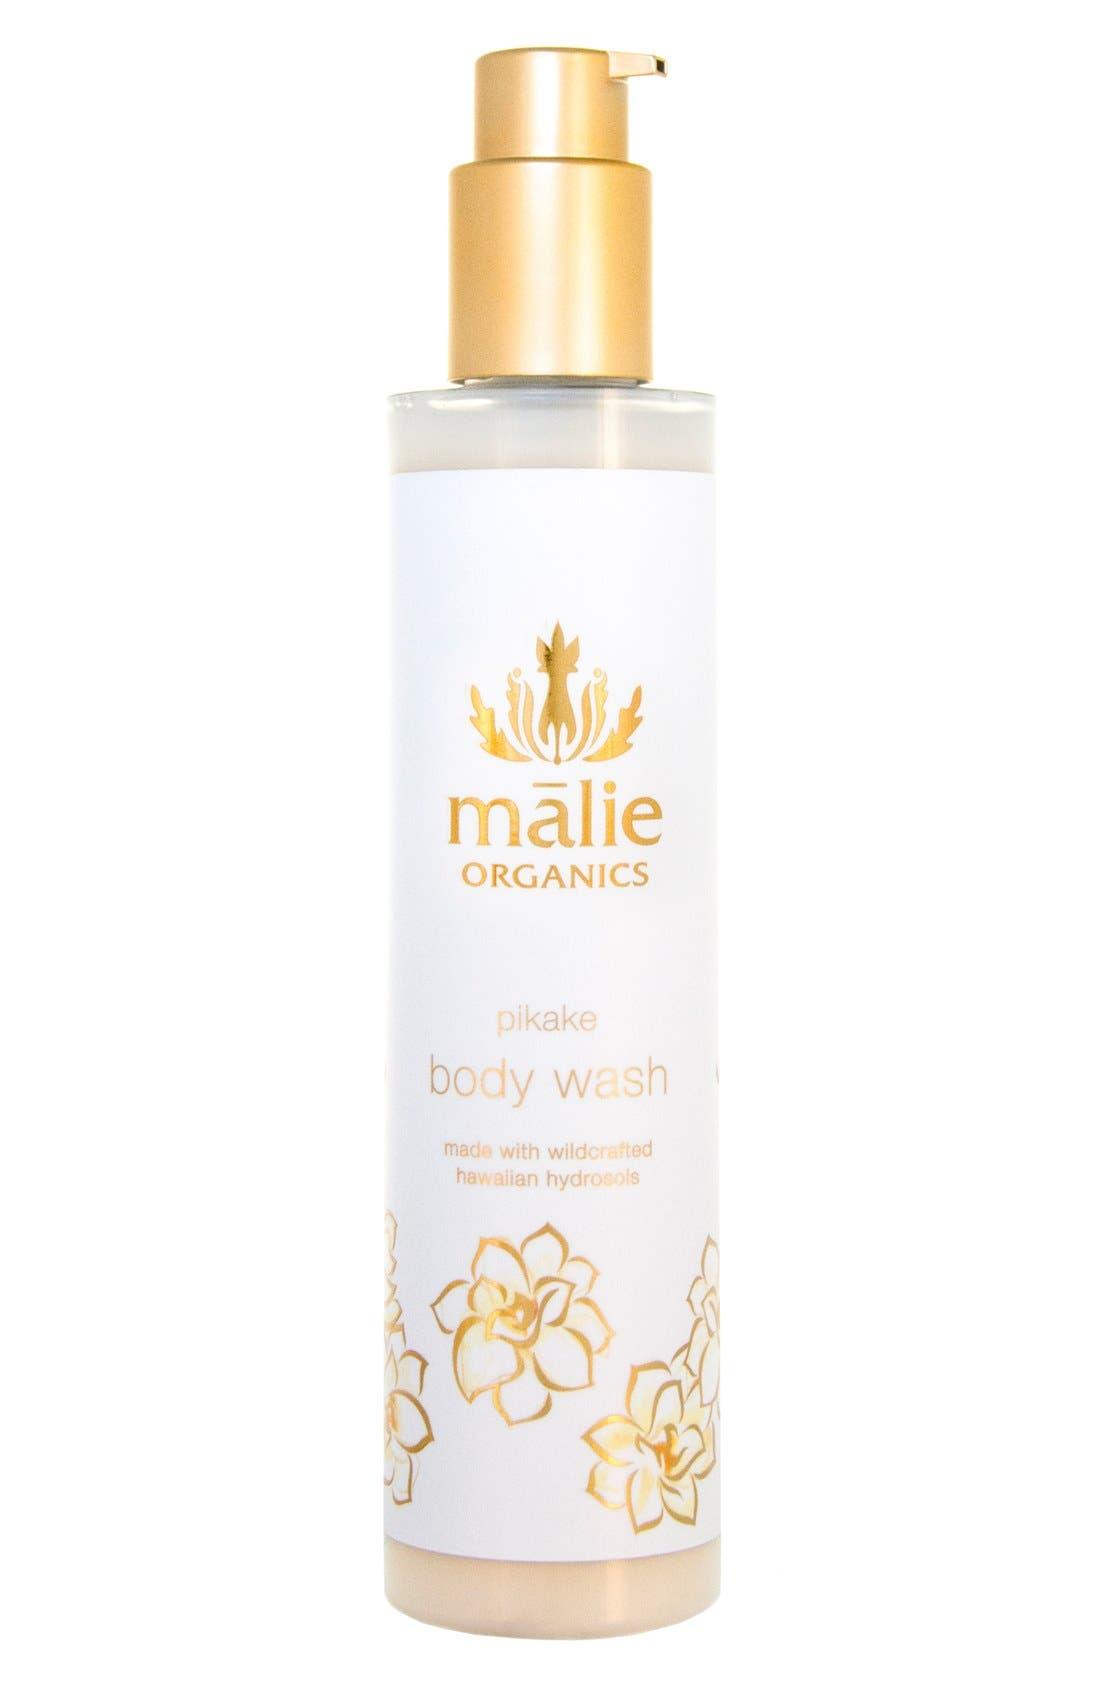 Malie Organics Pikake Organic Body Wash